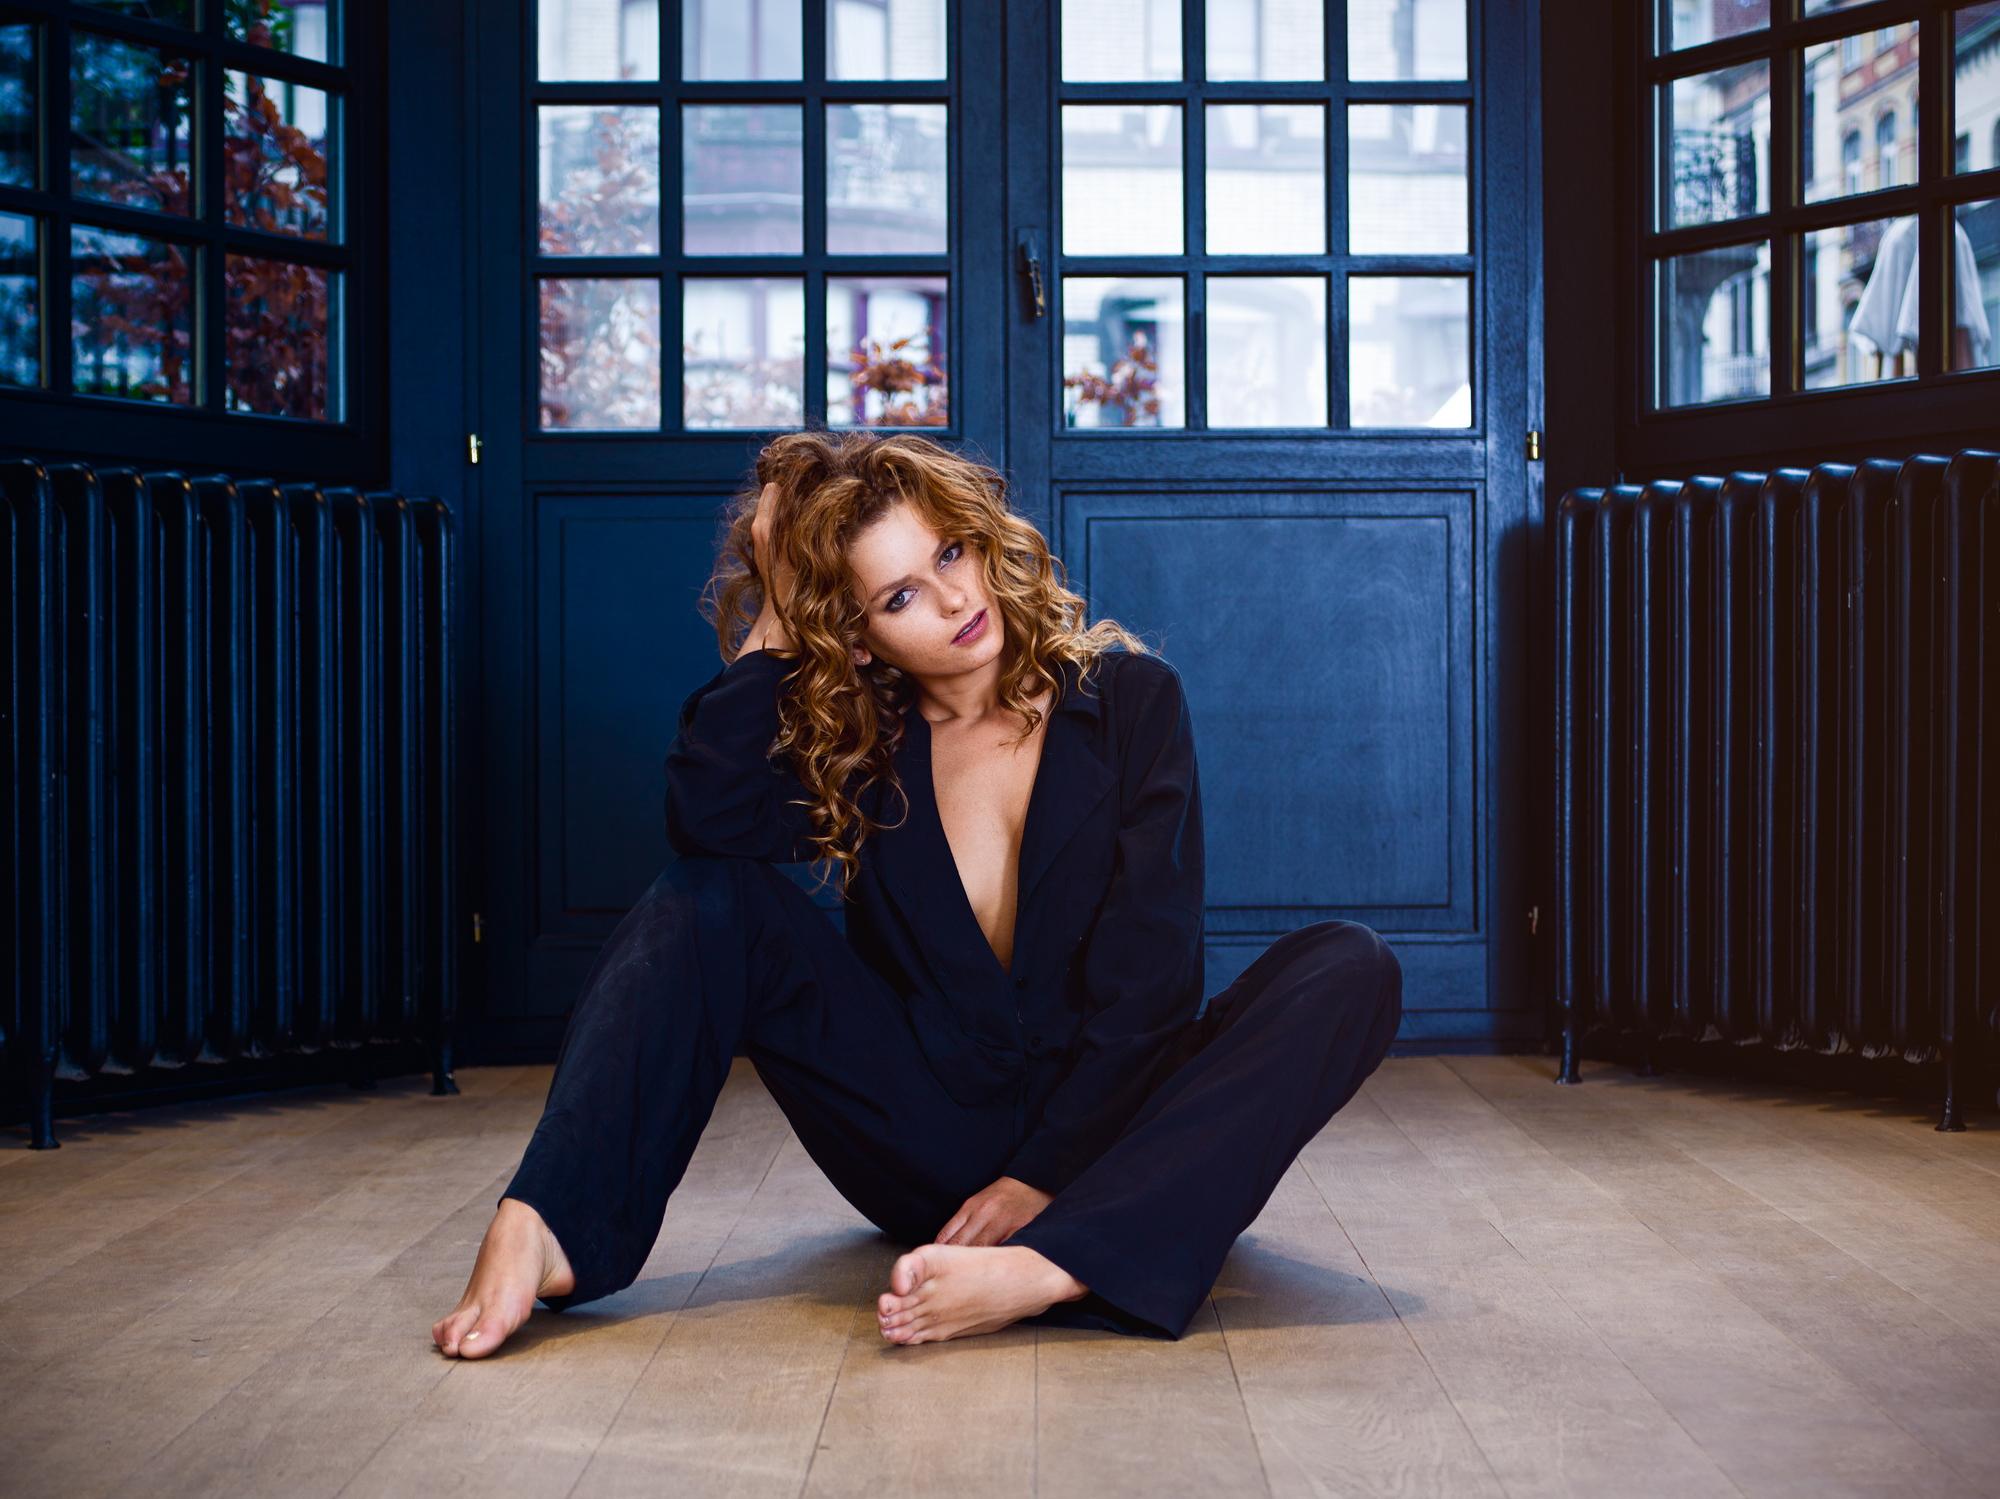 julia-yaroshenko-redhead-erotic-model-freckles-nude-lennylw-03